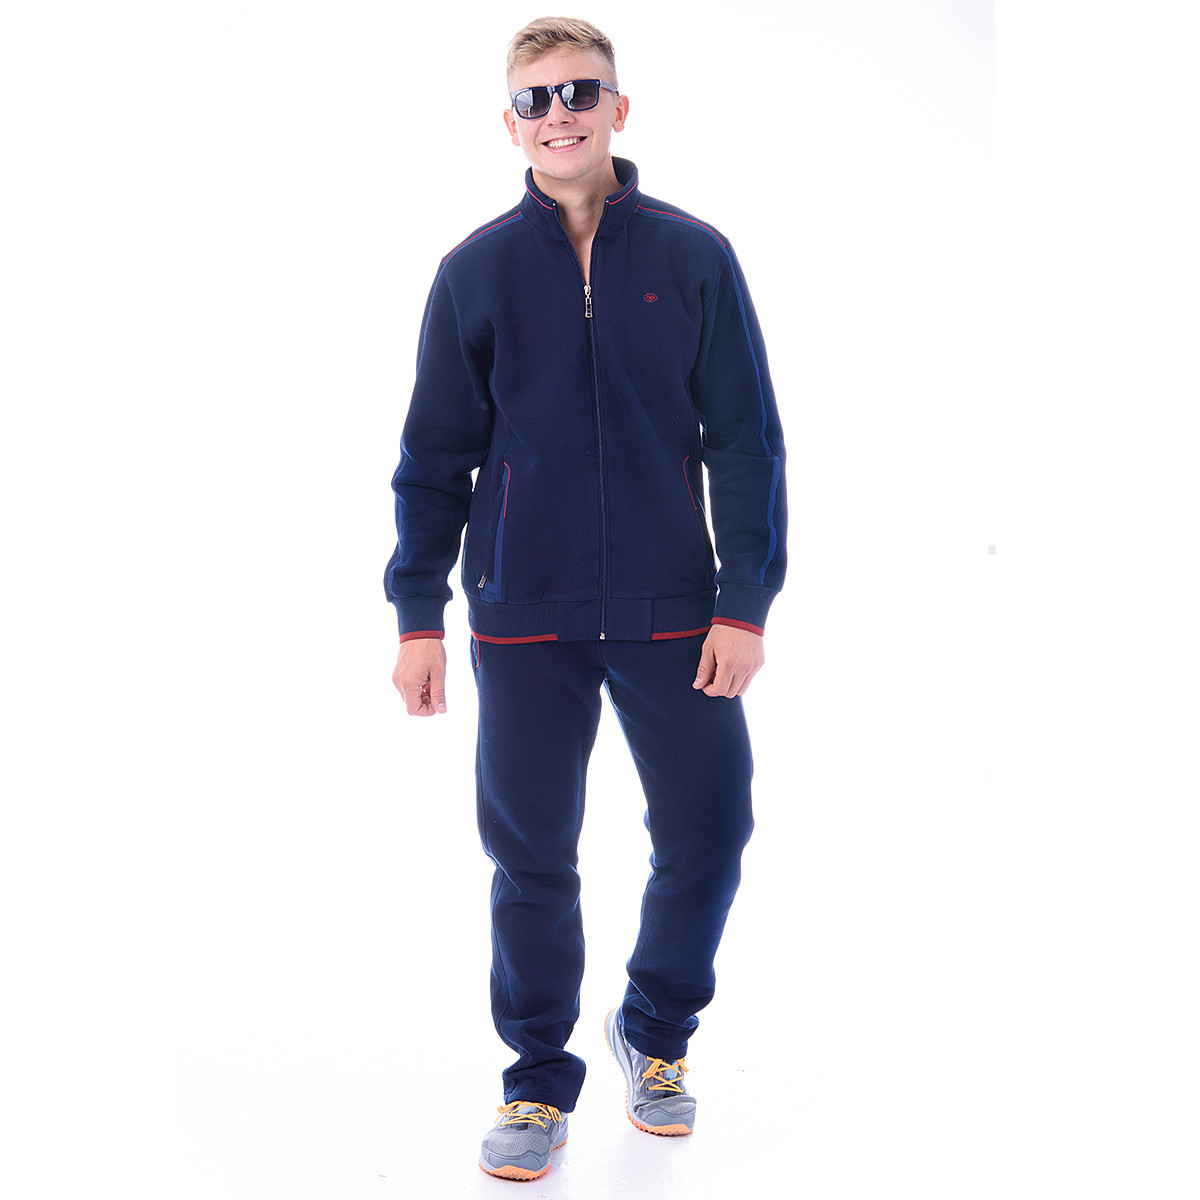 Турецкий теплый спортивный костюм байка Piyera 5012-1